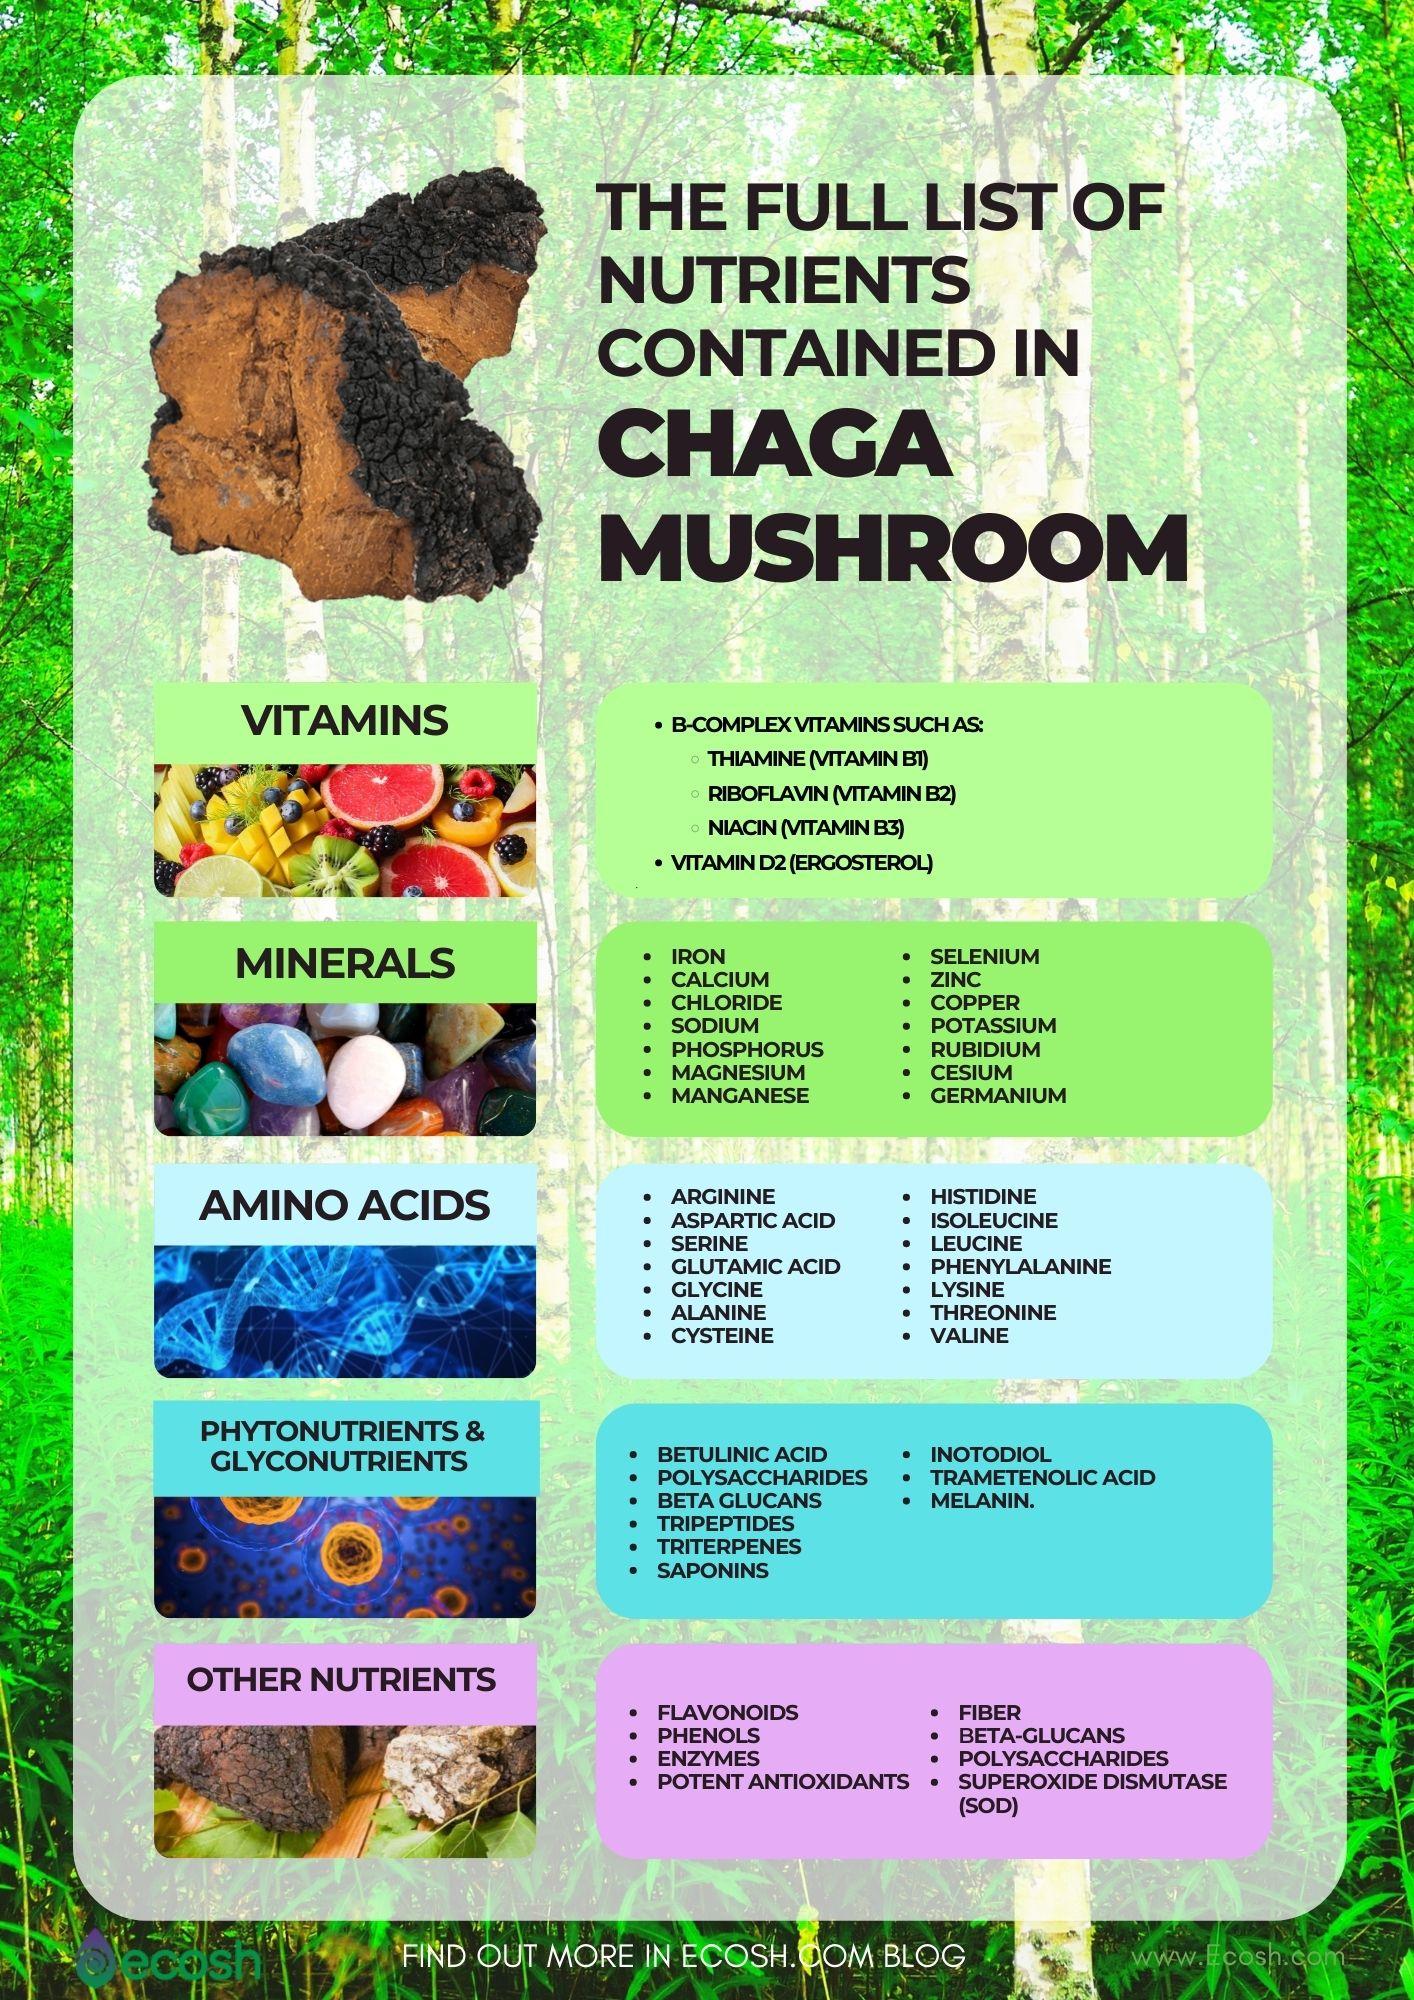 Ecosh_The_Full_List_of_Nutrients_Contained_In_Chaga_Vitamins_In_Chaga_Minerals_in_Chaga_Amino_Acids_In_Chaga_Mushroom_Antioxidants_In_Chaga_SOD_In_Chaga_Mushroom_Vitamins_Contained_In_Chaga_